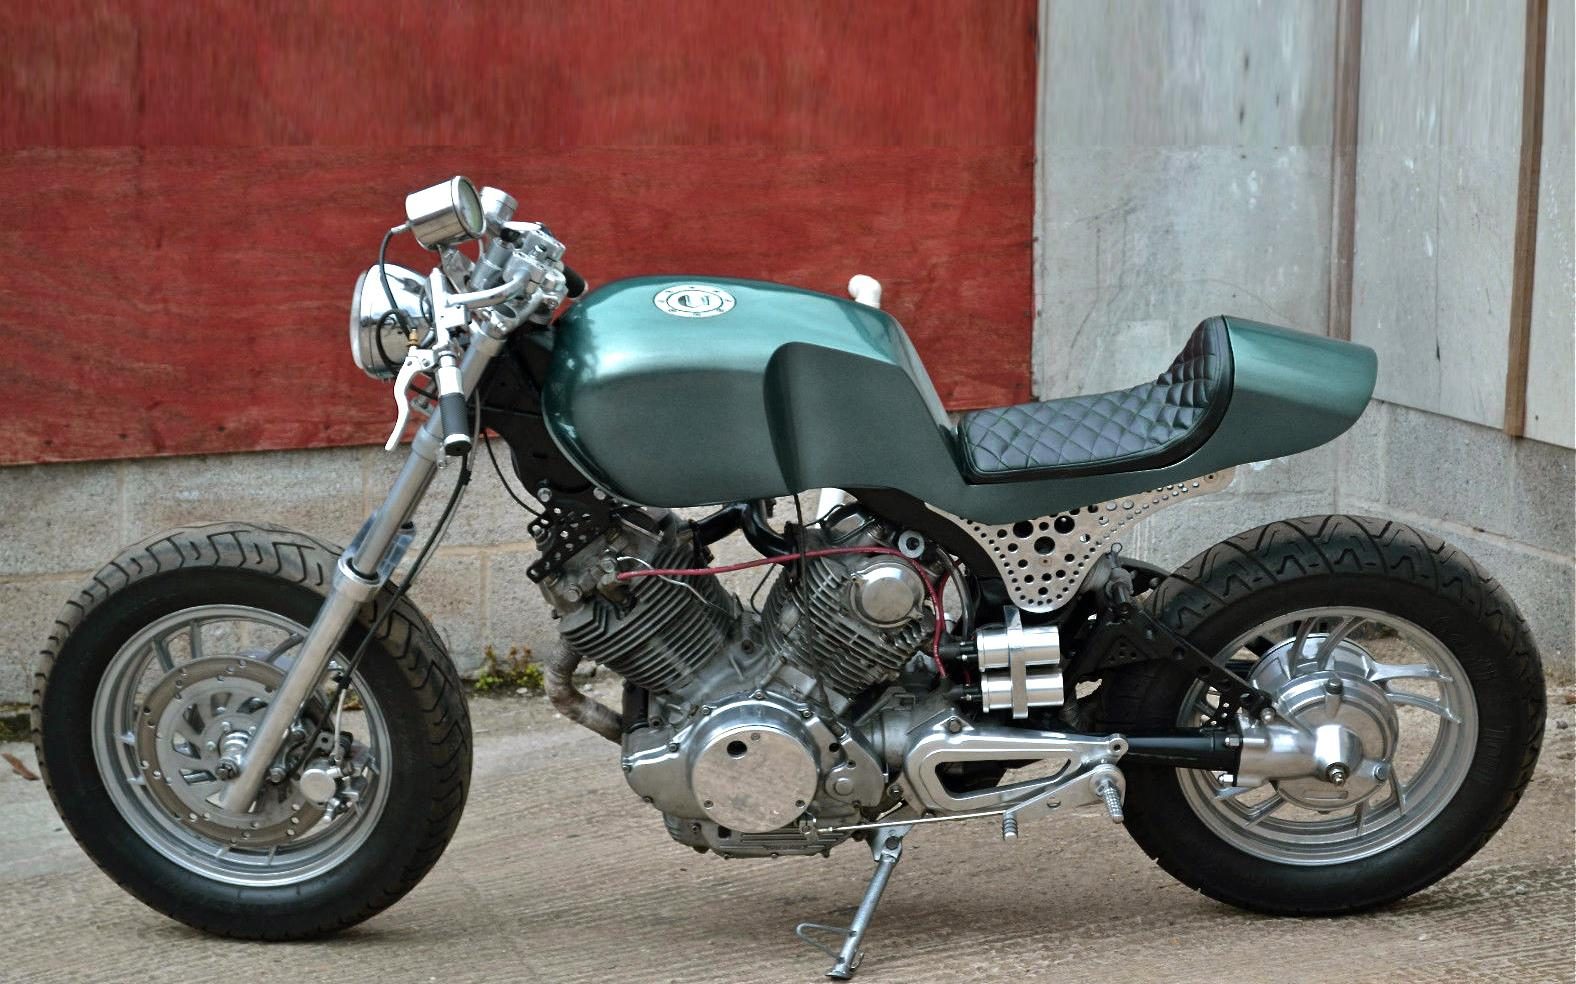 yamaha xv750 monocoque cafe racer motorrad fotos. Black Bedroom Furniture Sets. Home Design Ideas